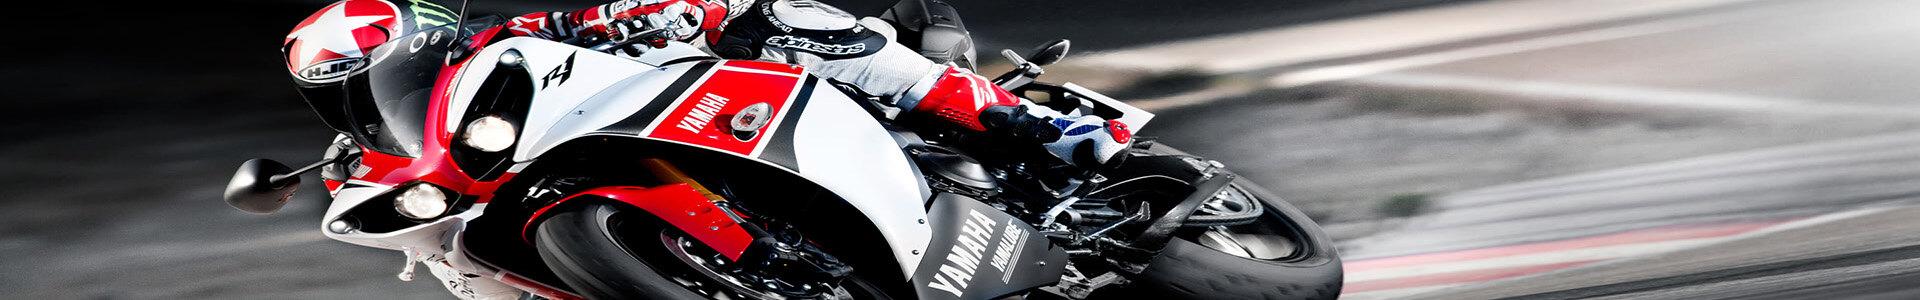 ORILLIA MOTOR SPORTS 1-705-325-6311 new and used Yamaha and